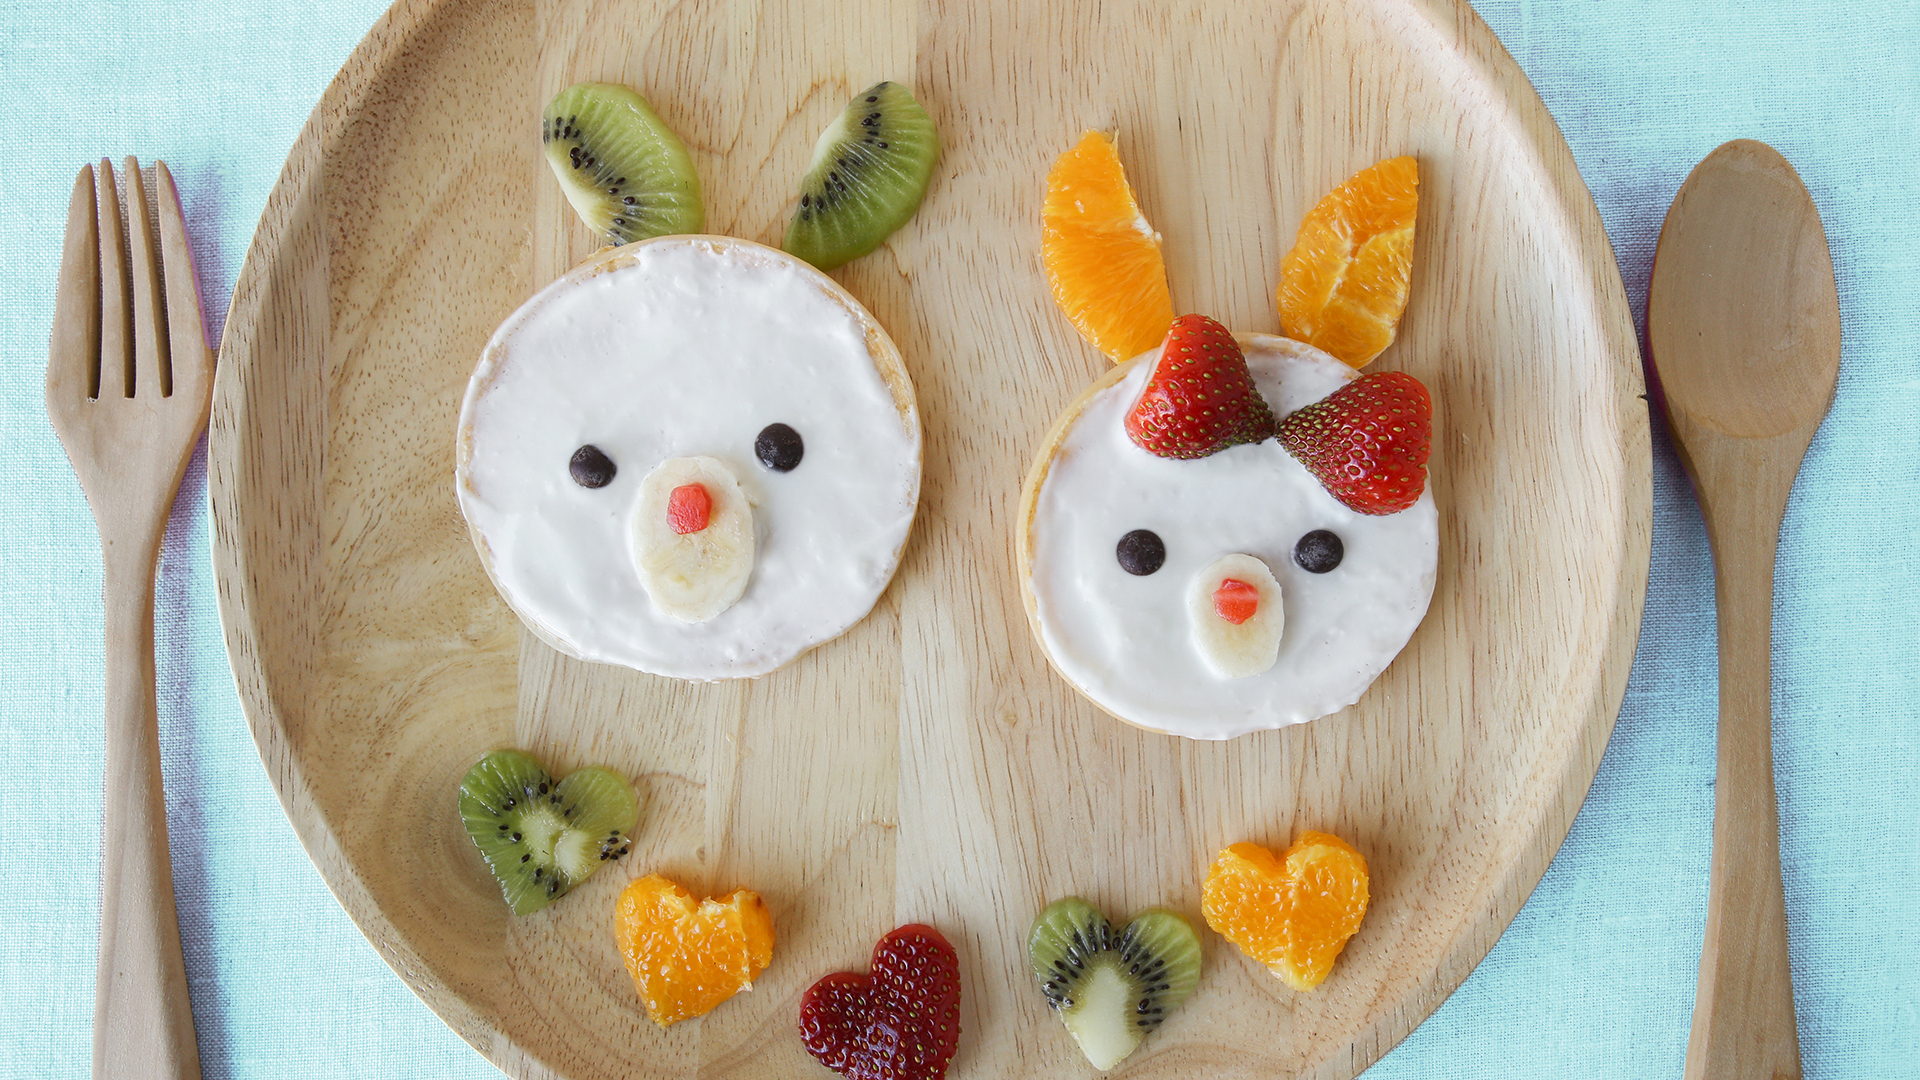 15 Cute Easter Breakfast Ideas Your Kids Will Love Sheknows